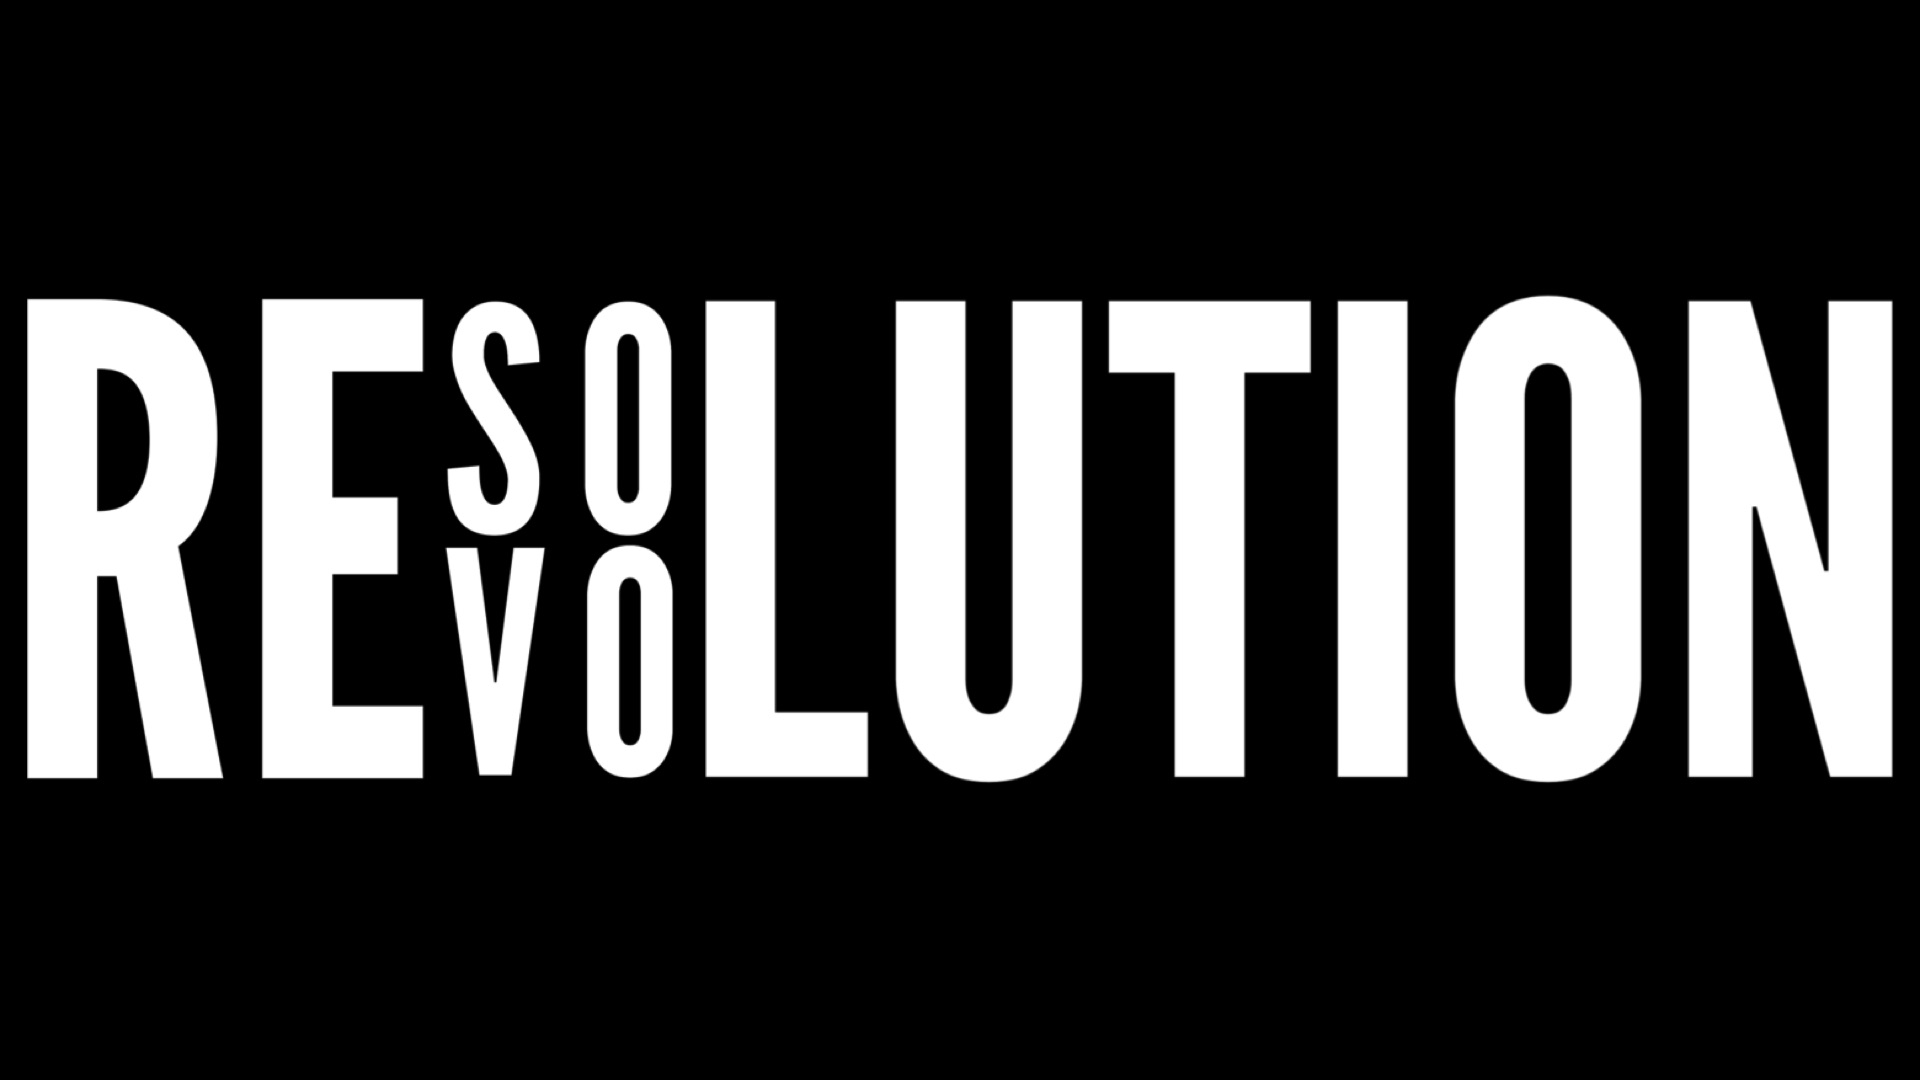 Resolution Revolution - (January 7, 2018 - February 18, 2018)